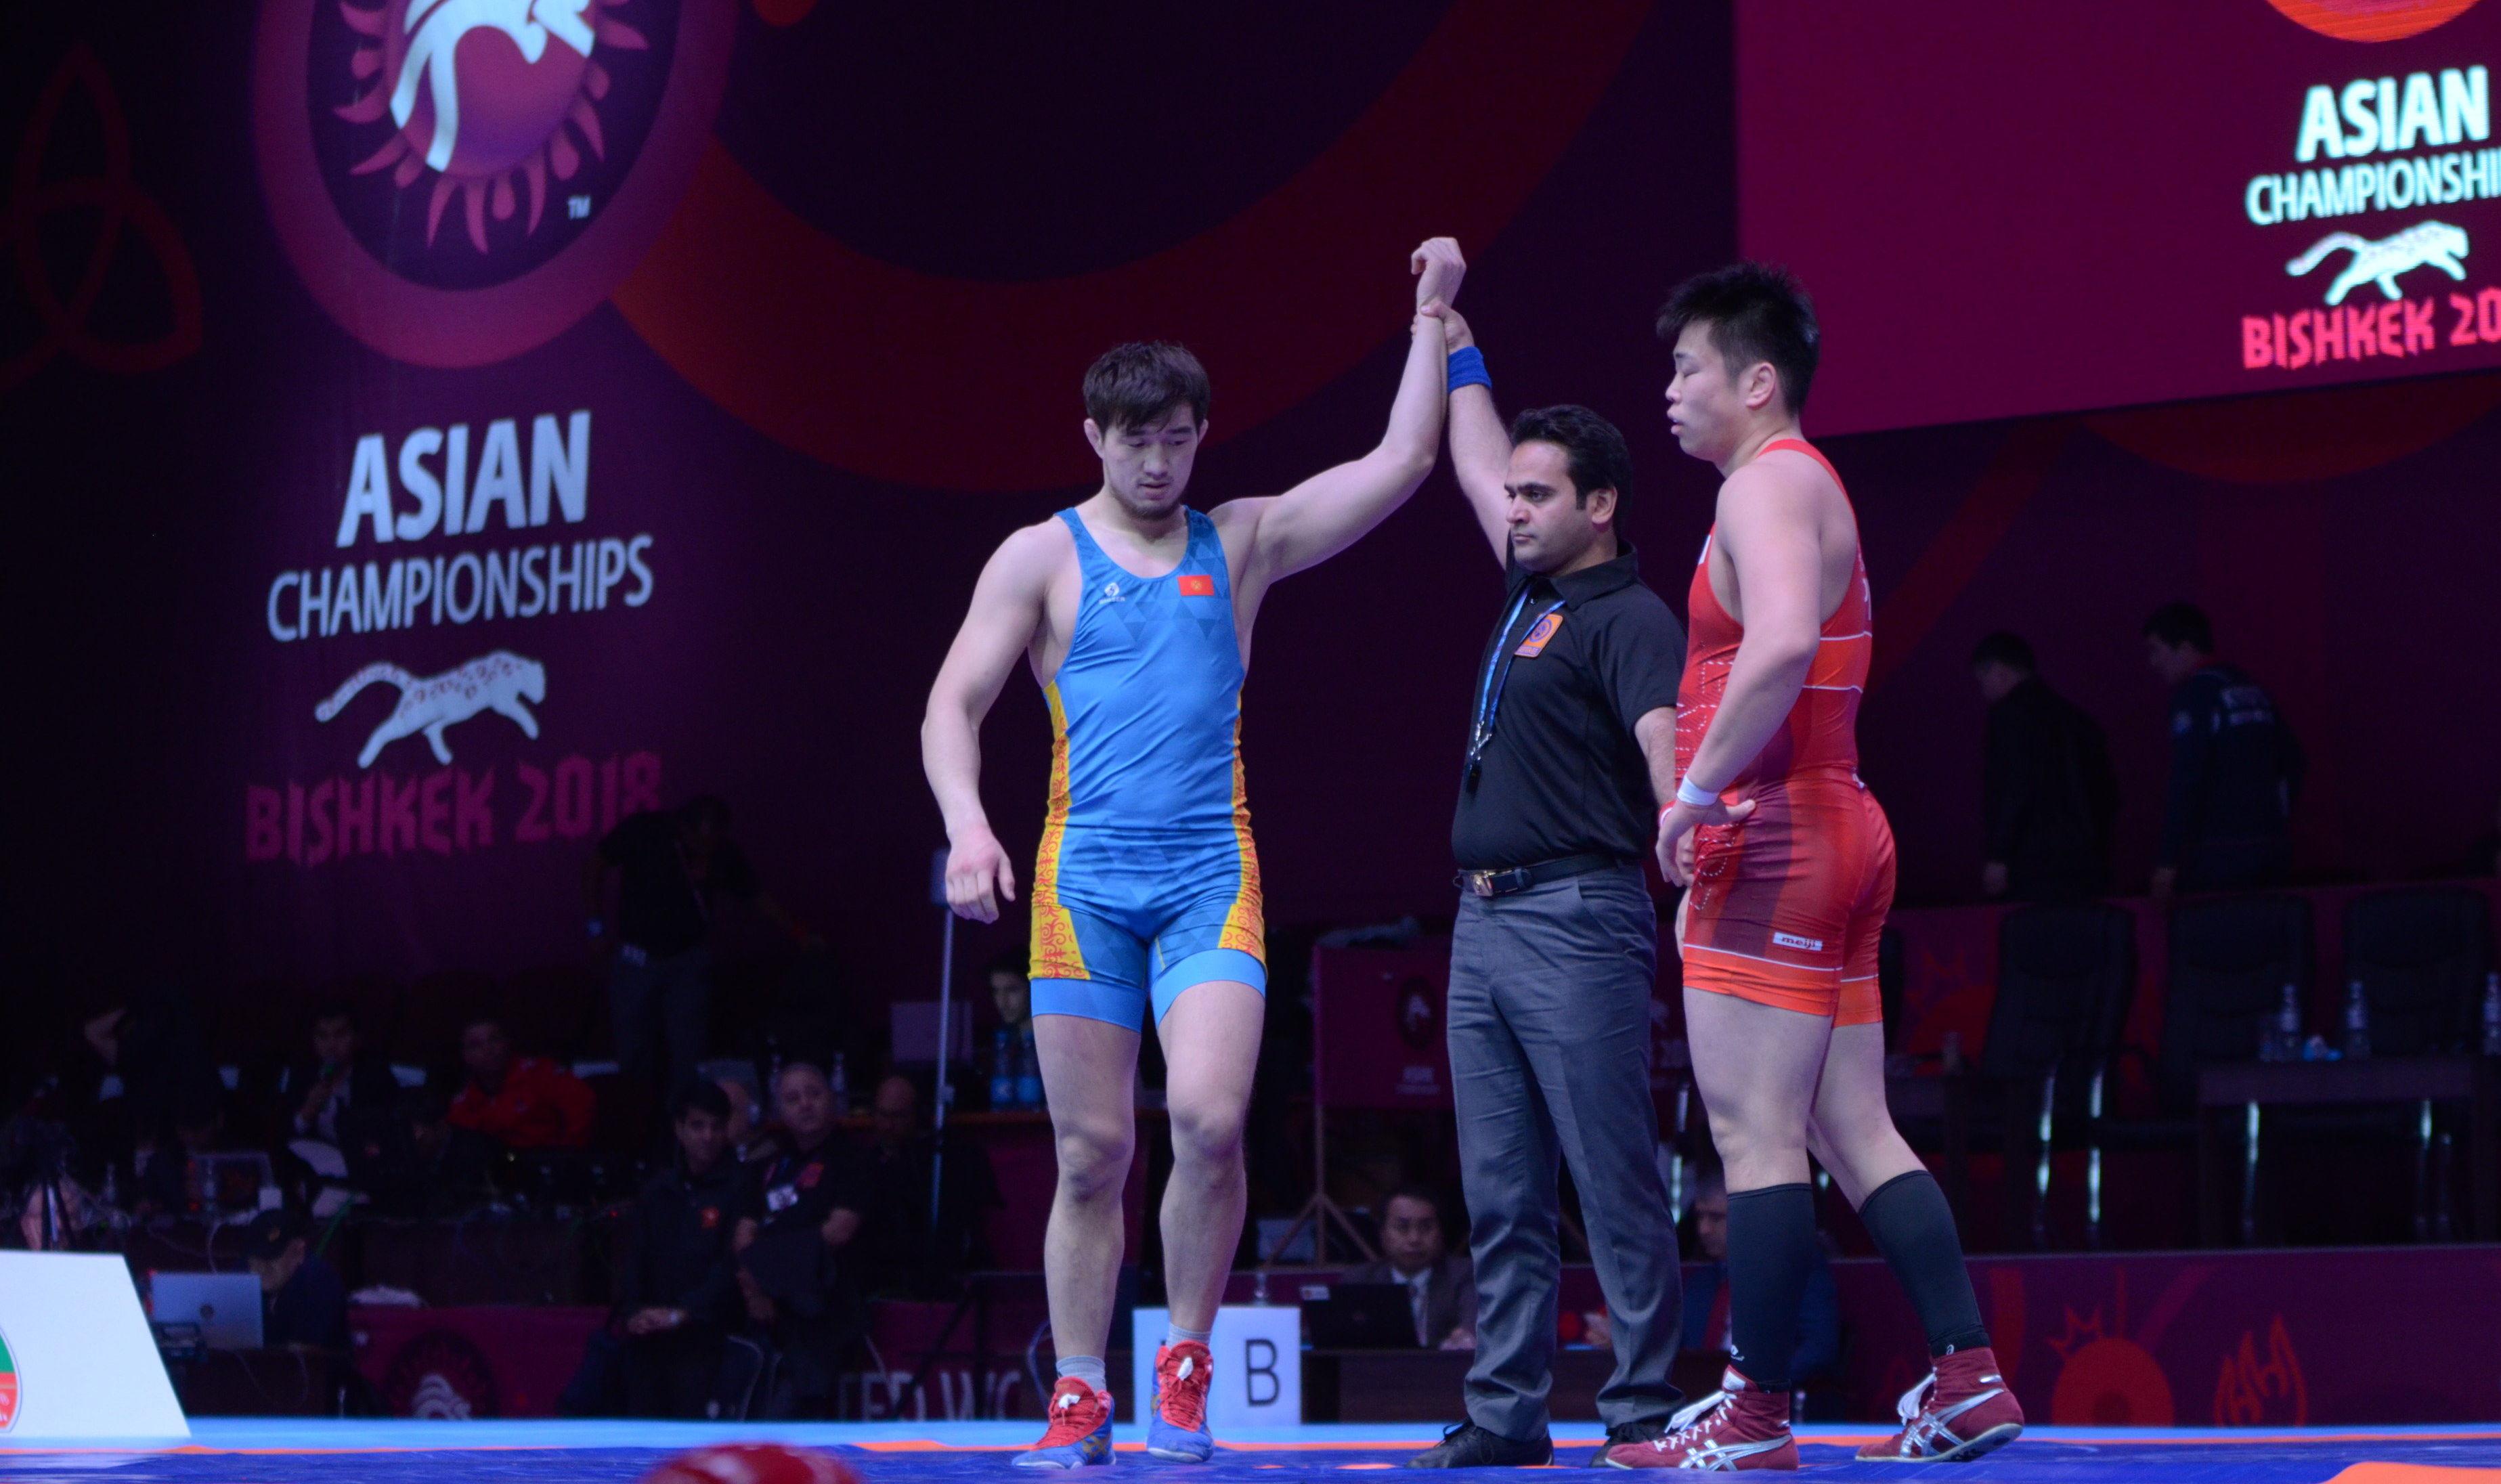 Борец греко-римского стиля Узур Жусупбеков (97) выиграл японца Юту Нару